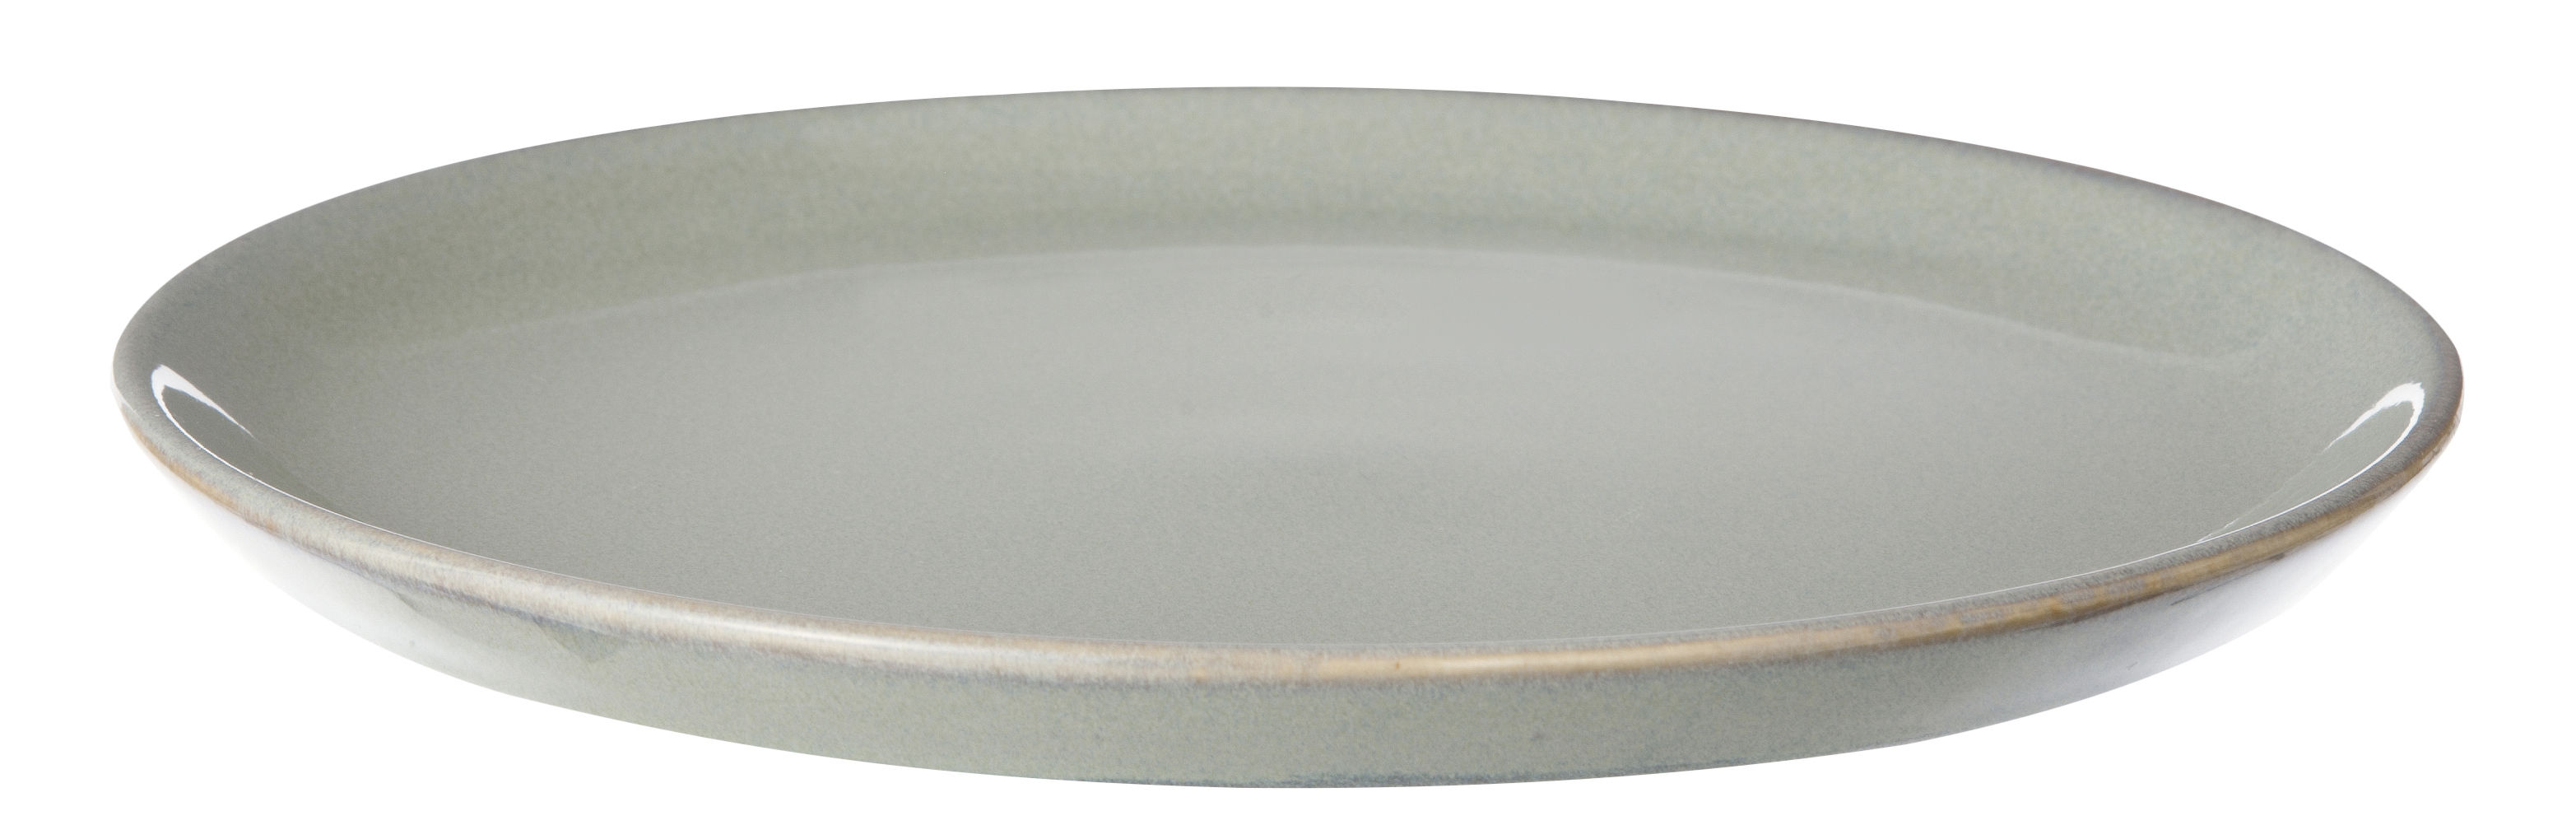 Tischkultur - Teller - Neu Dessertteller / Ø 22 cm - Ferm Living - Grau - emaillierte Keramik